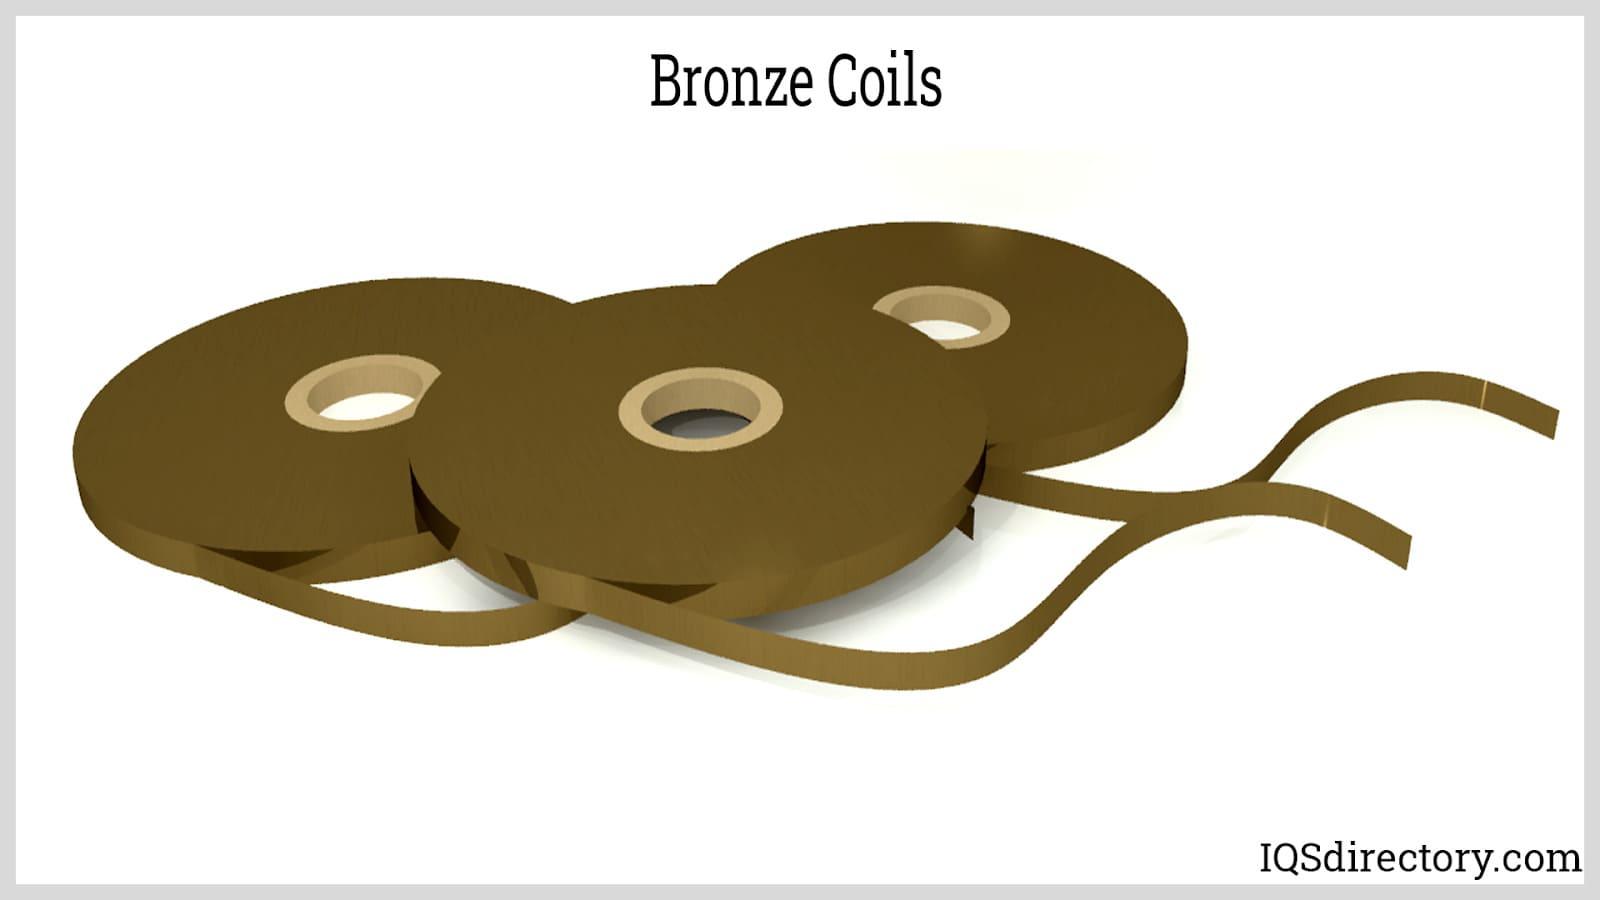 Bronze Coils